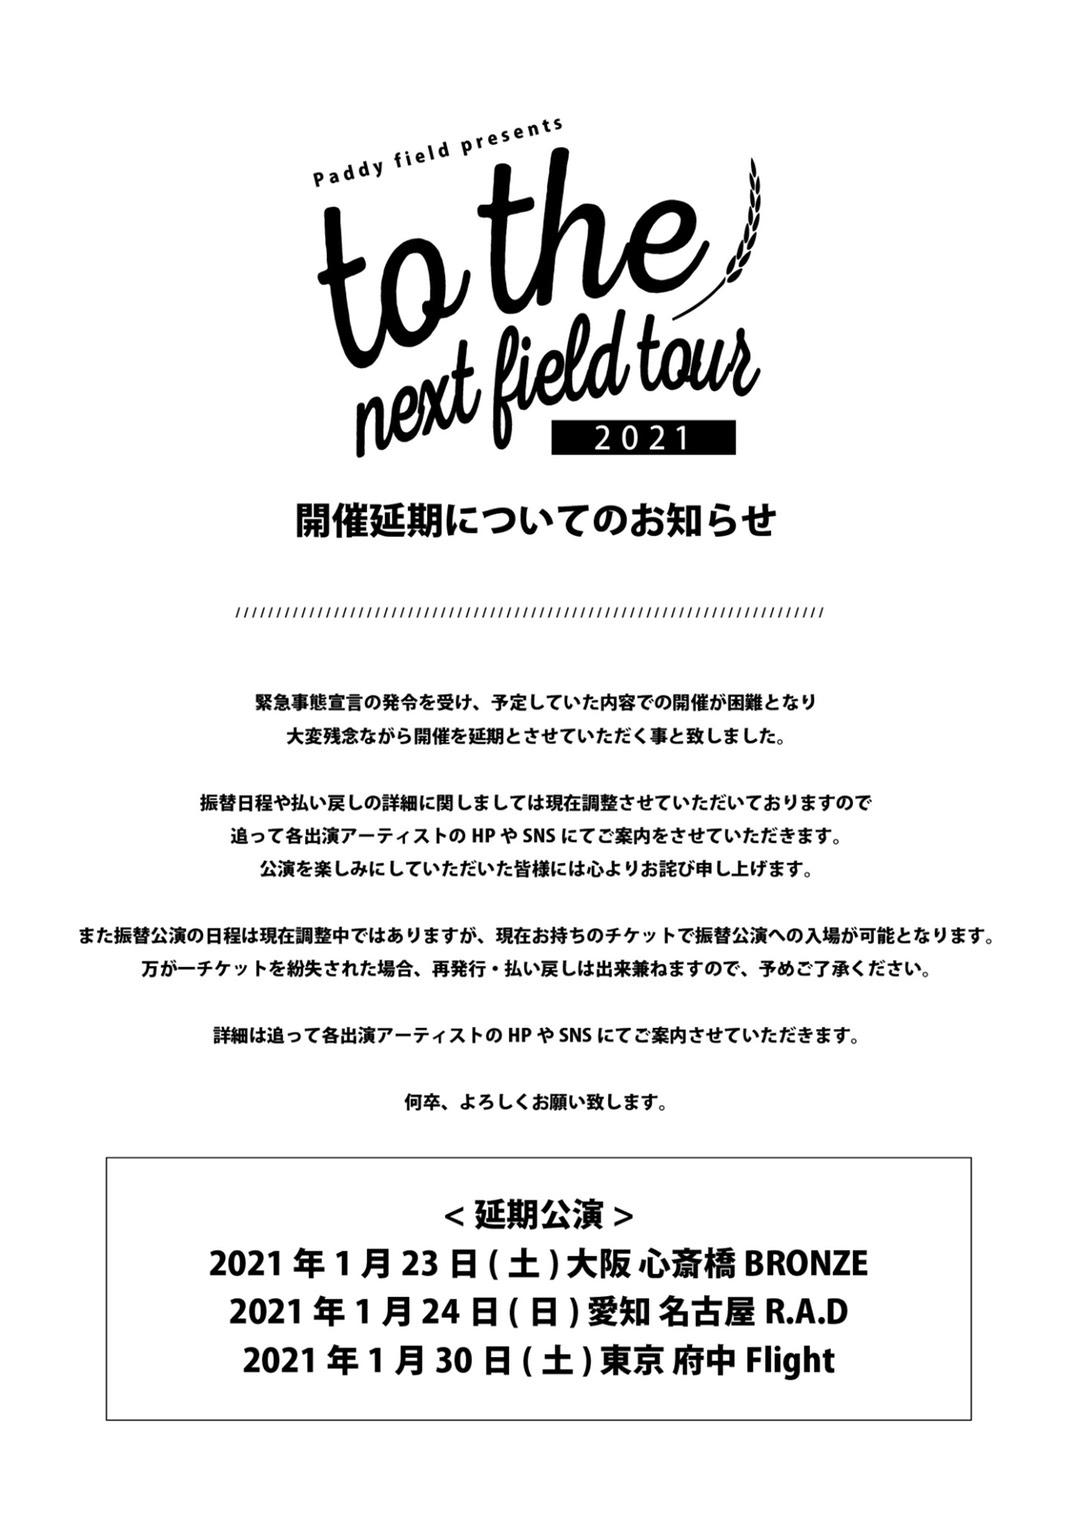 "(※公演延期)Paddy field presents ""to the next field tour 2021"""